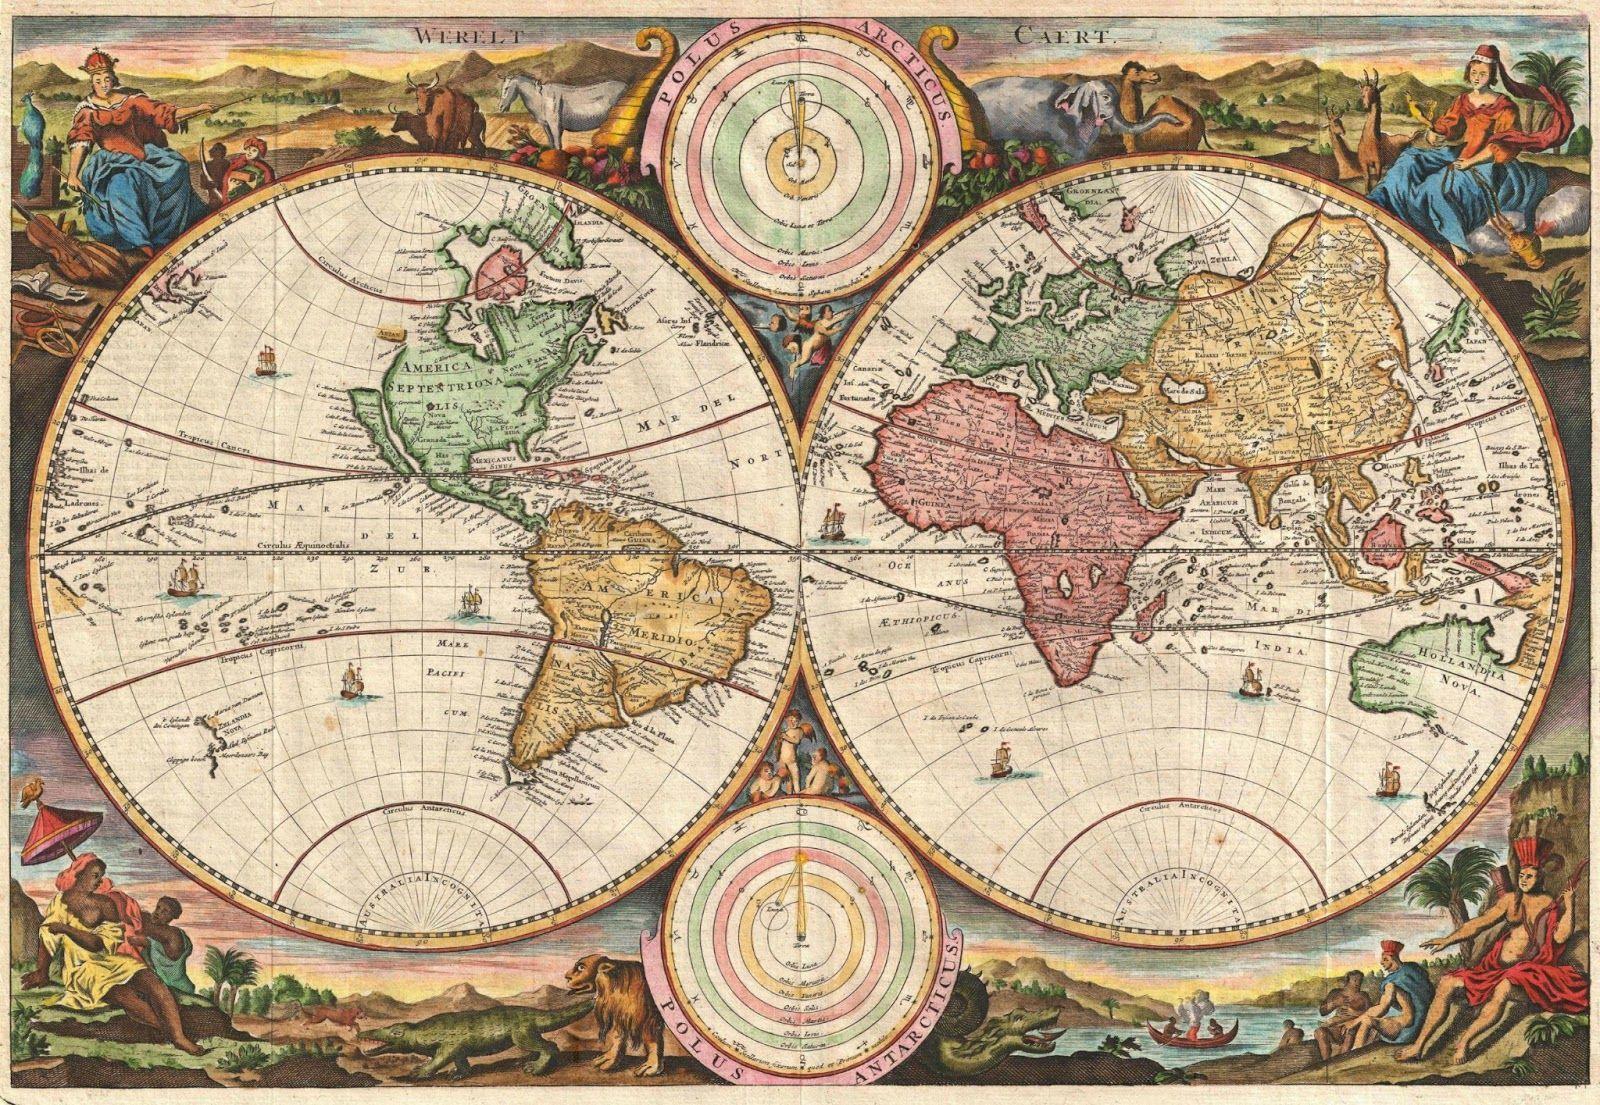 Ancient world map highest res jpg 4000 x 2765 pixel 96 dpi file ancient world map highest res jpg 4000 x 2765 pixel 96 dpi file gumiabroncs Choice Image